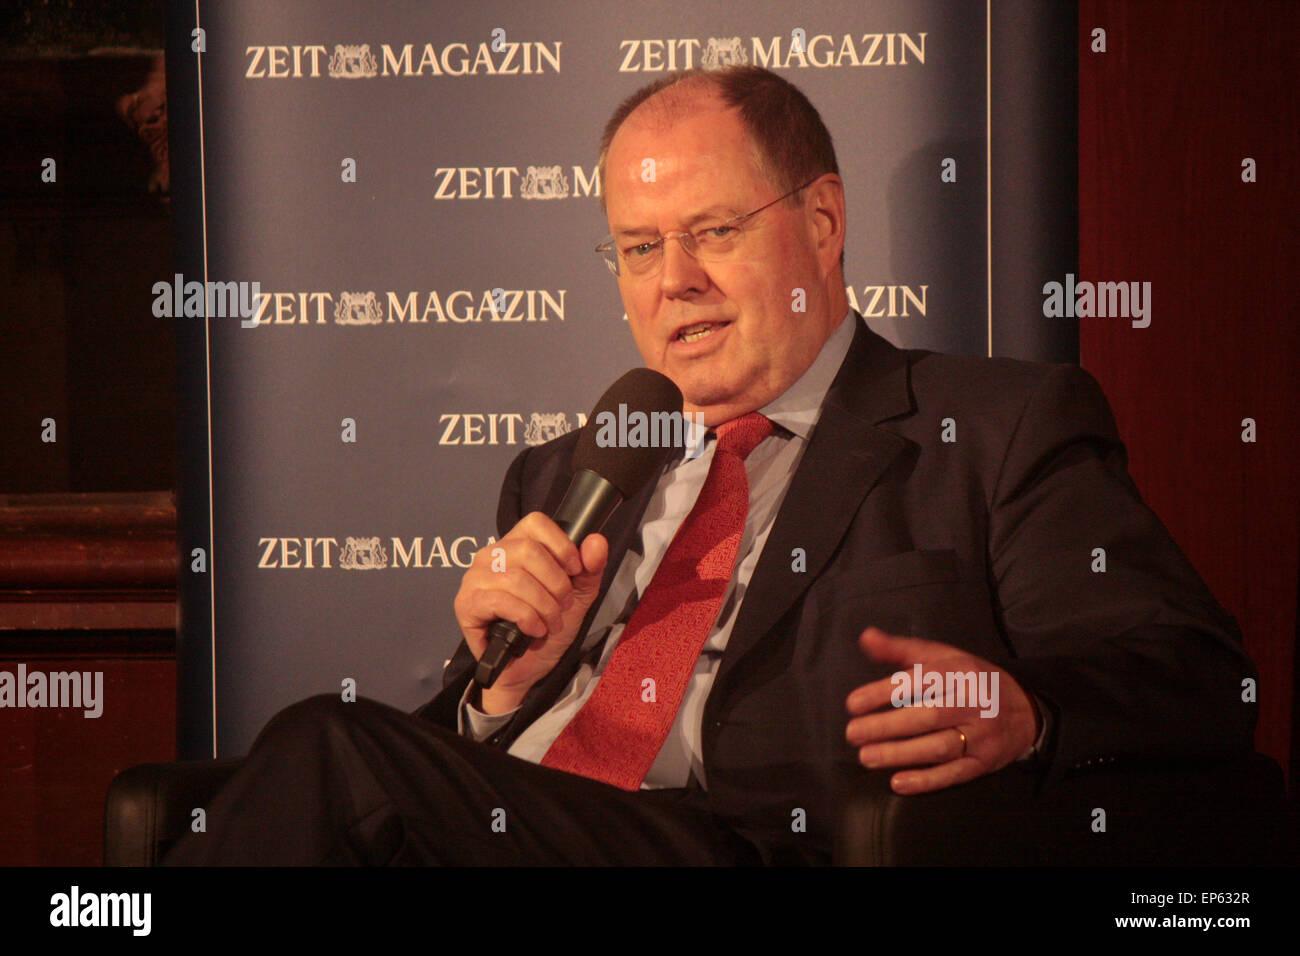 Peer Steinbrueck - Veranstaltung '99 Fragen live: Moritz von Uslar spricht Peer Steinbrueck' (veranstaltet - Stock Image